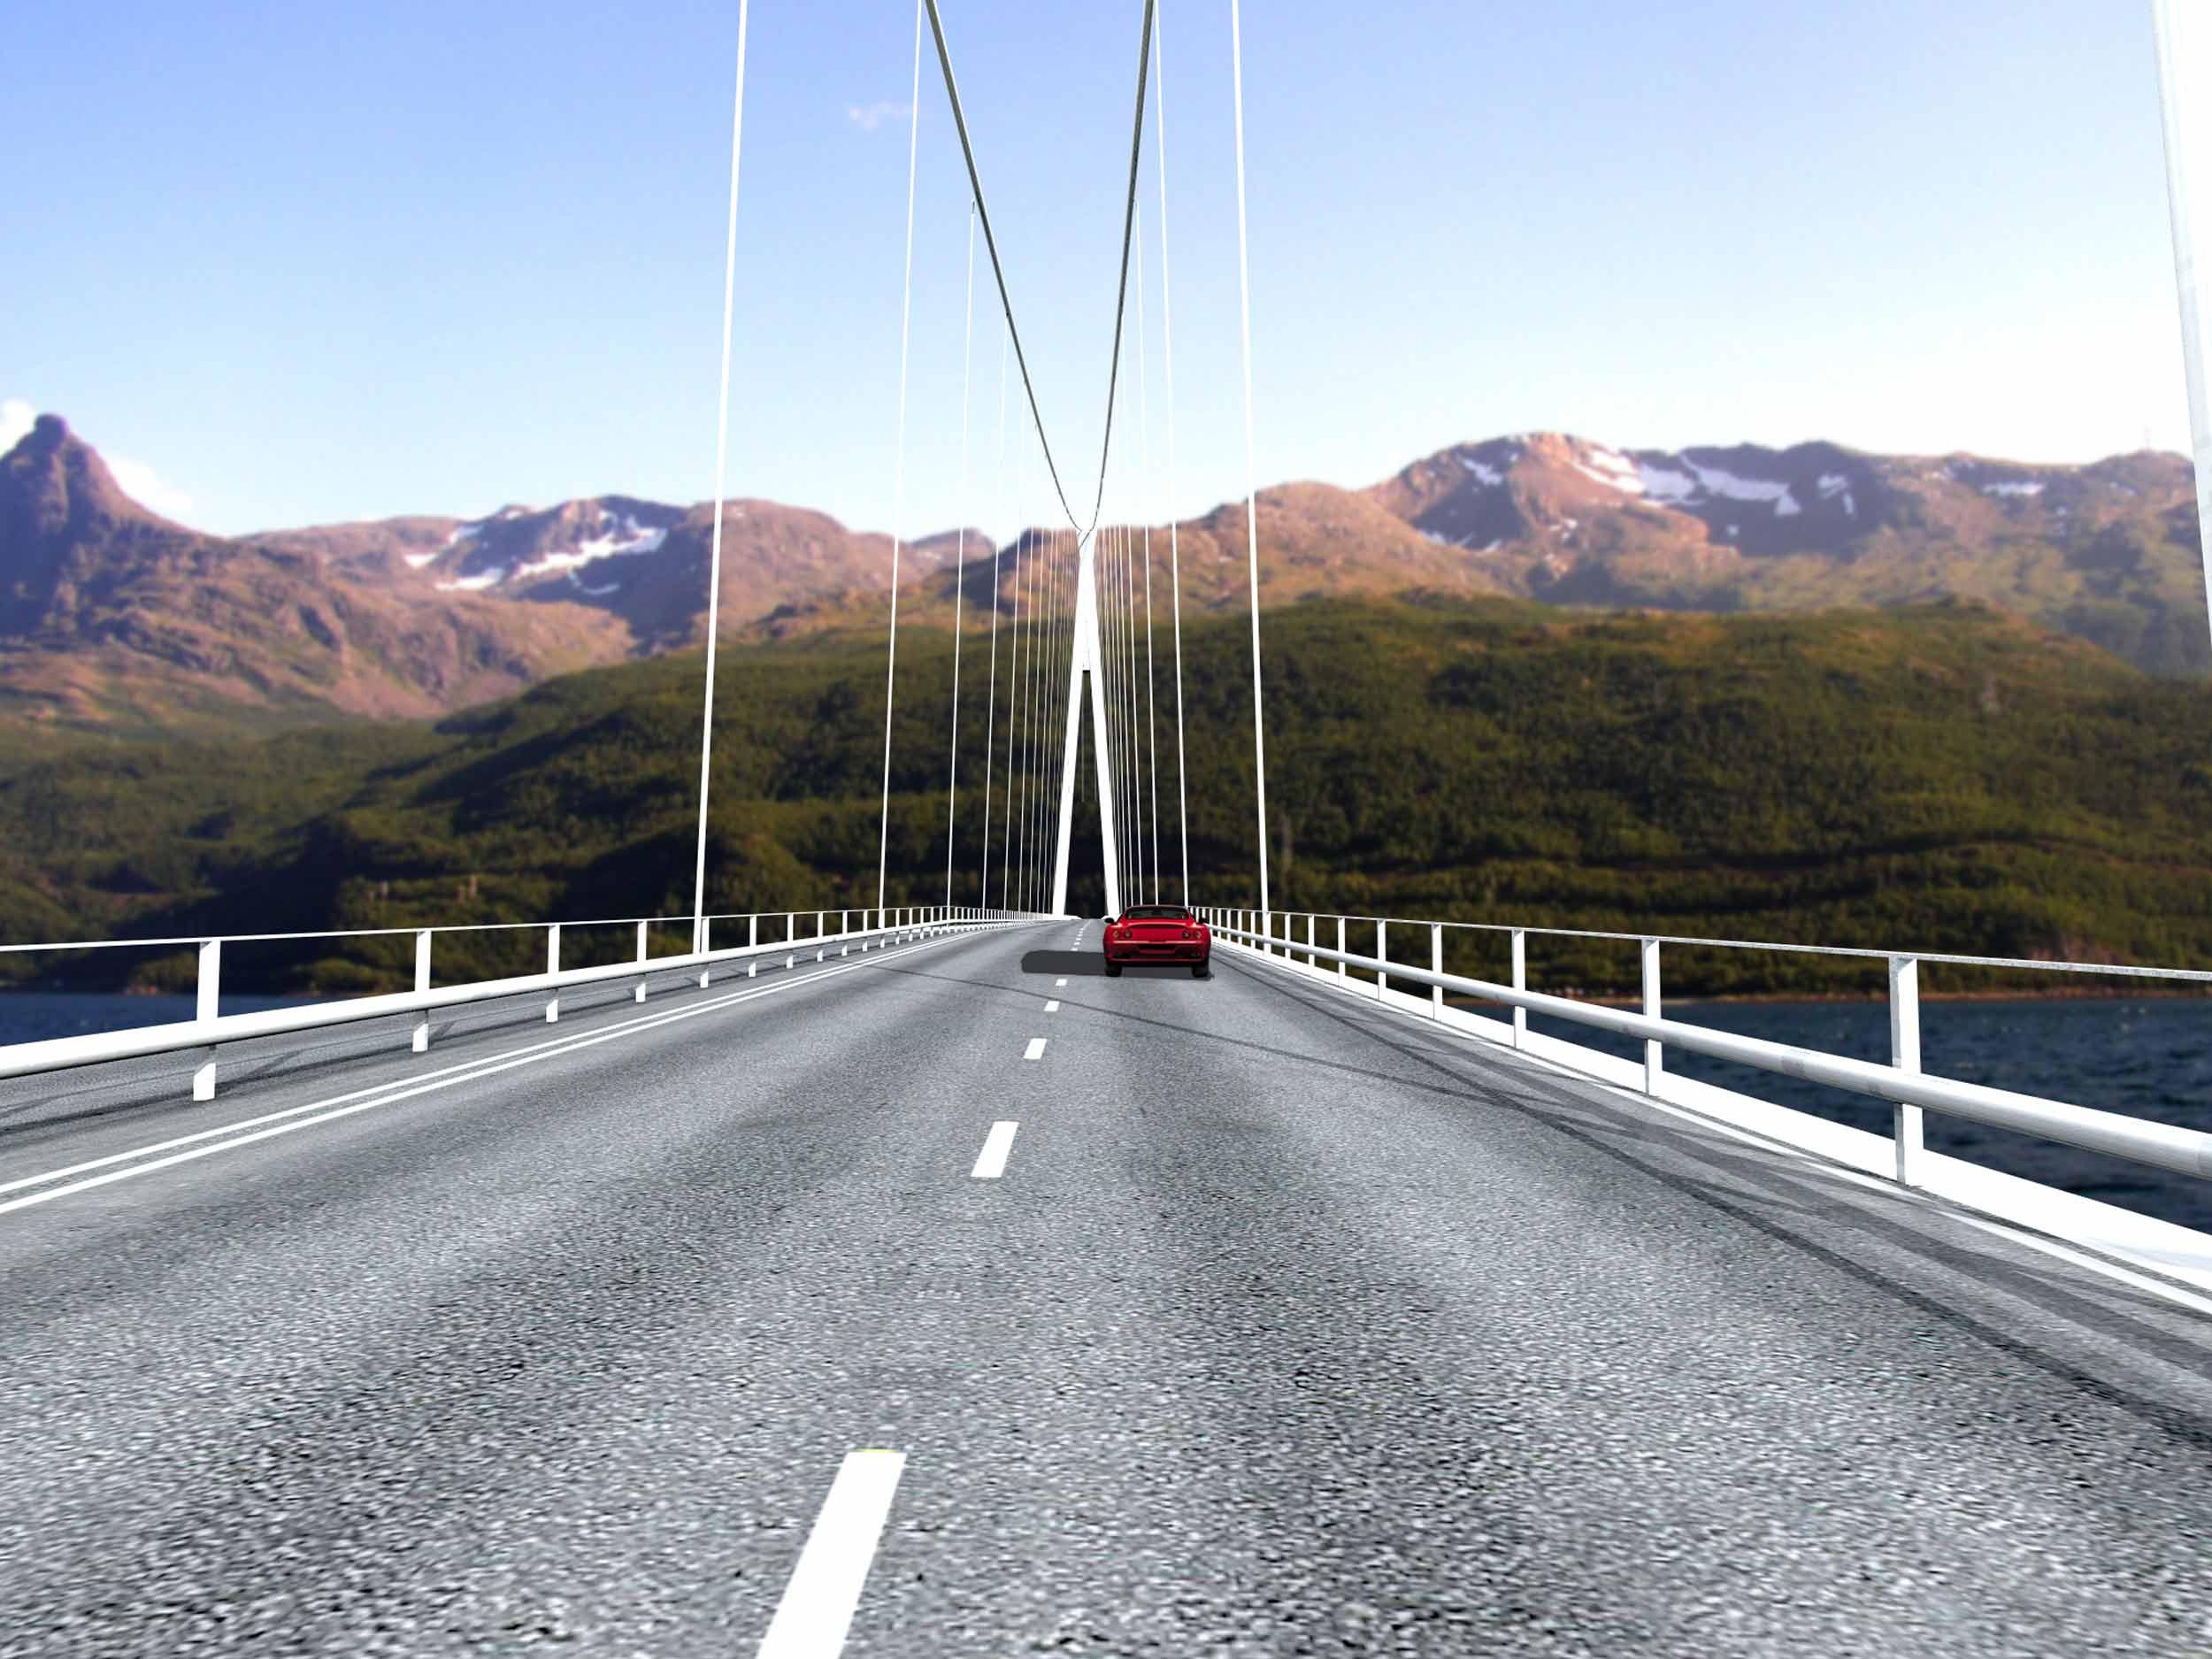 haalogaland_bridge_day_view_(4).jpg